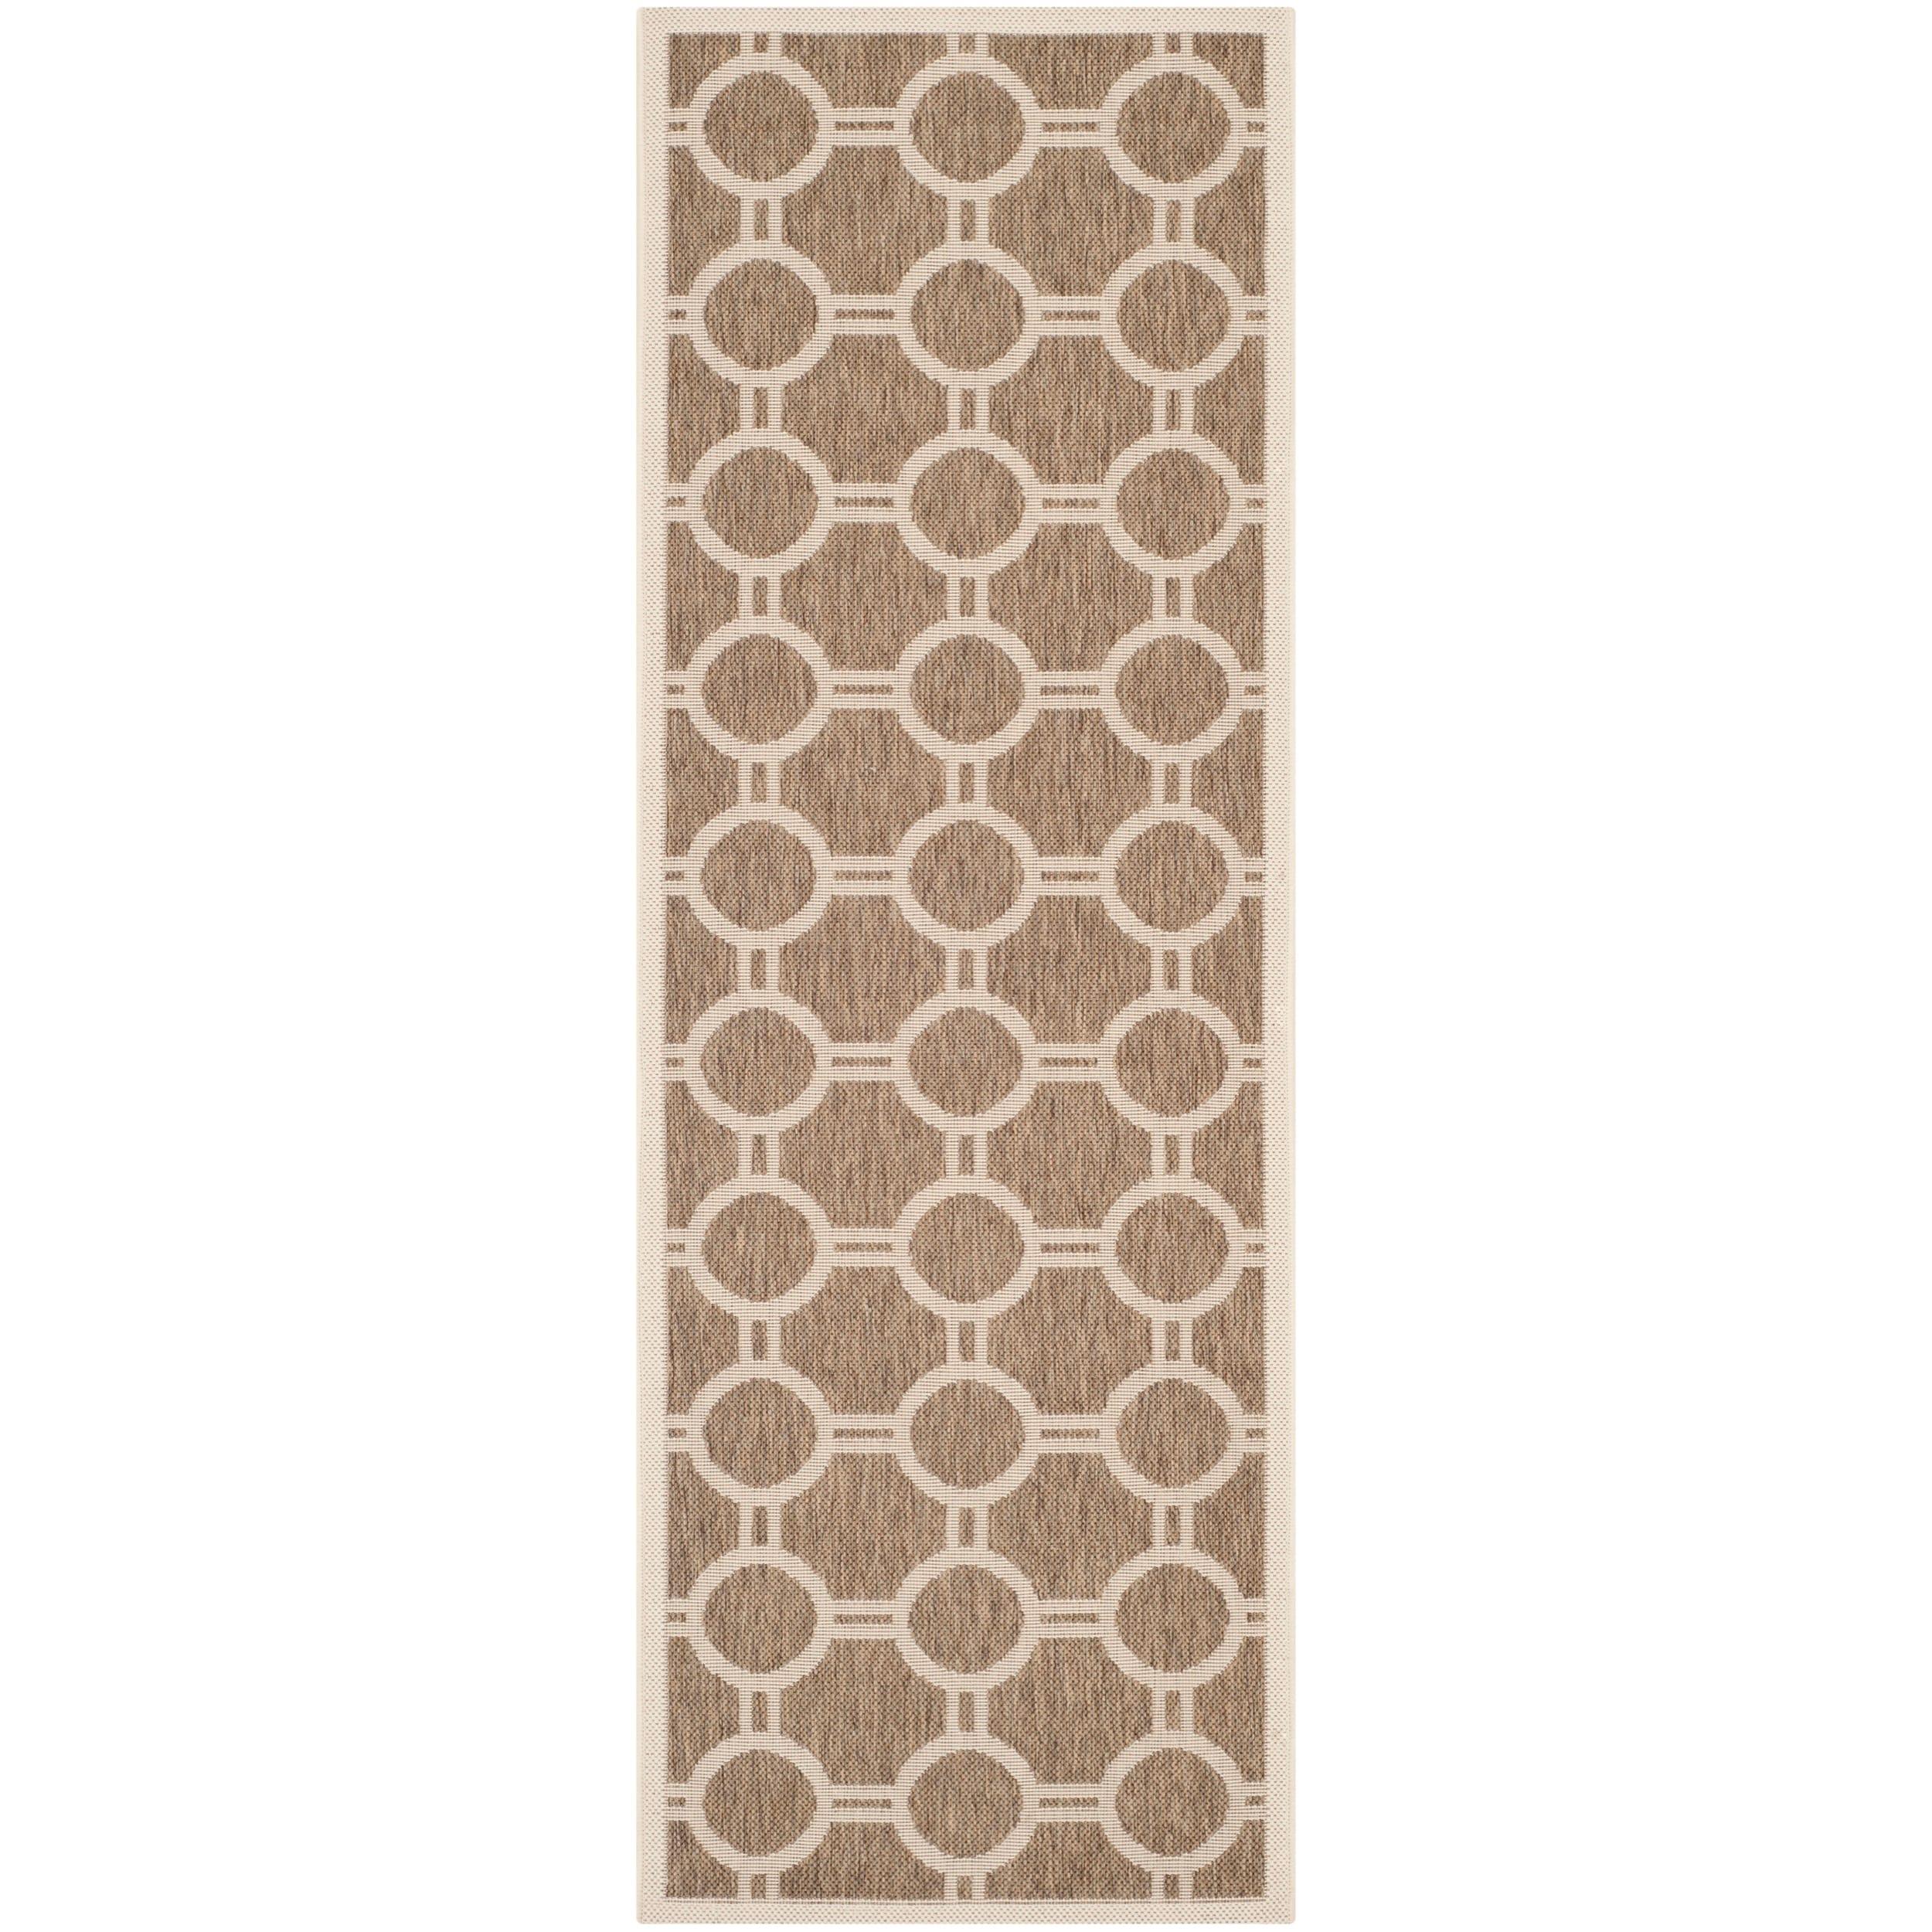 Safavieh Indoor/ Outdoor Courtyard Brown/ Bone Geometric Rug (23 X 67)